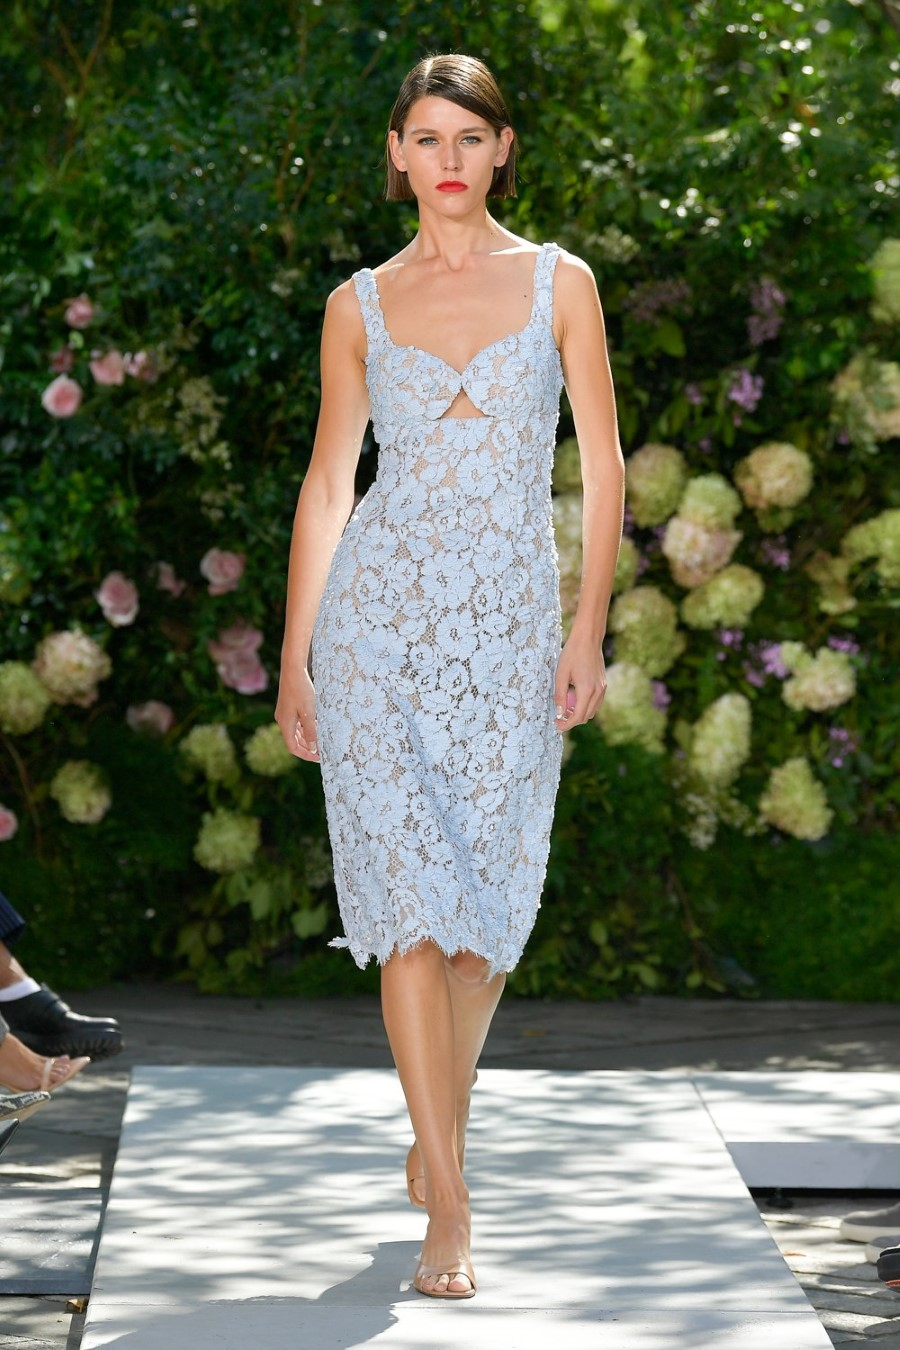 Michael Kors Collection Spring Summer 2022 - New York Fashion Week